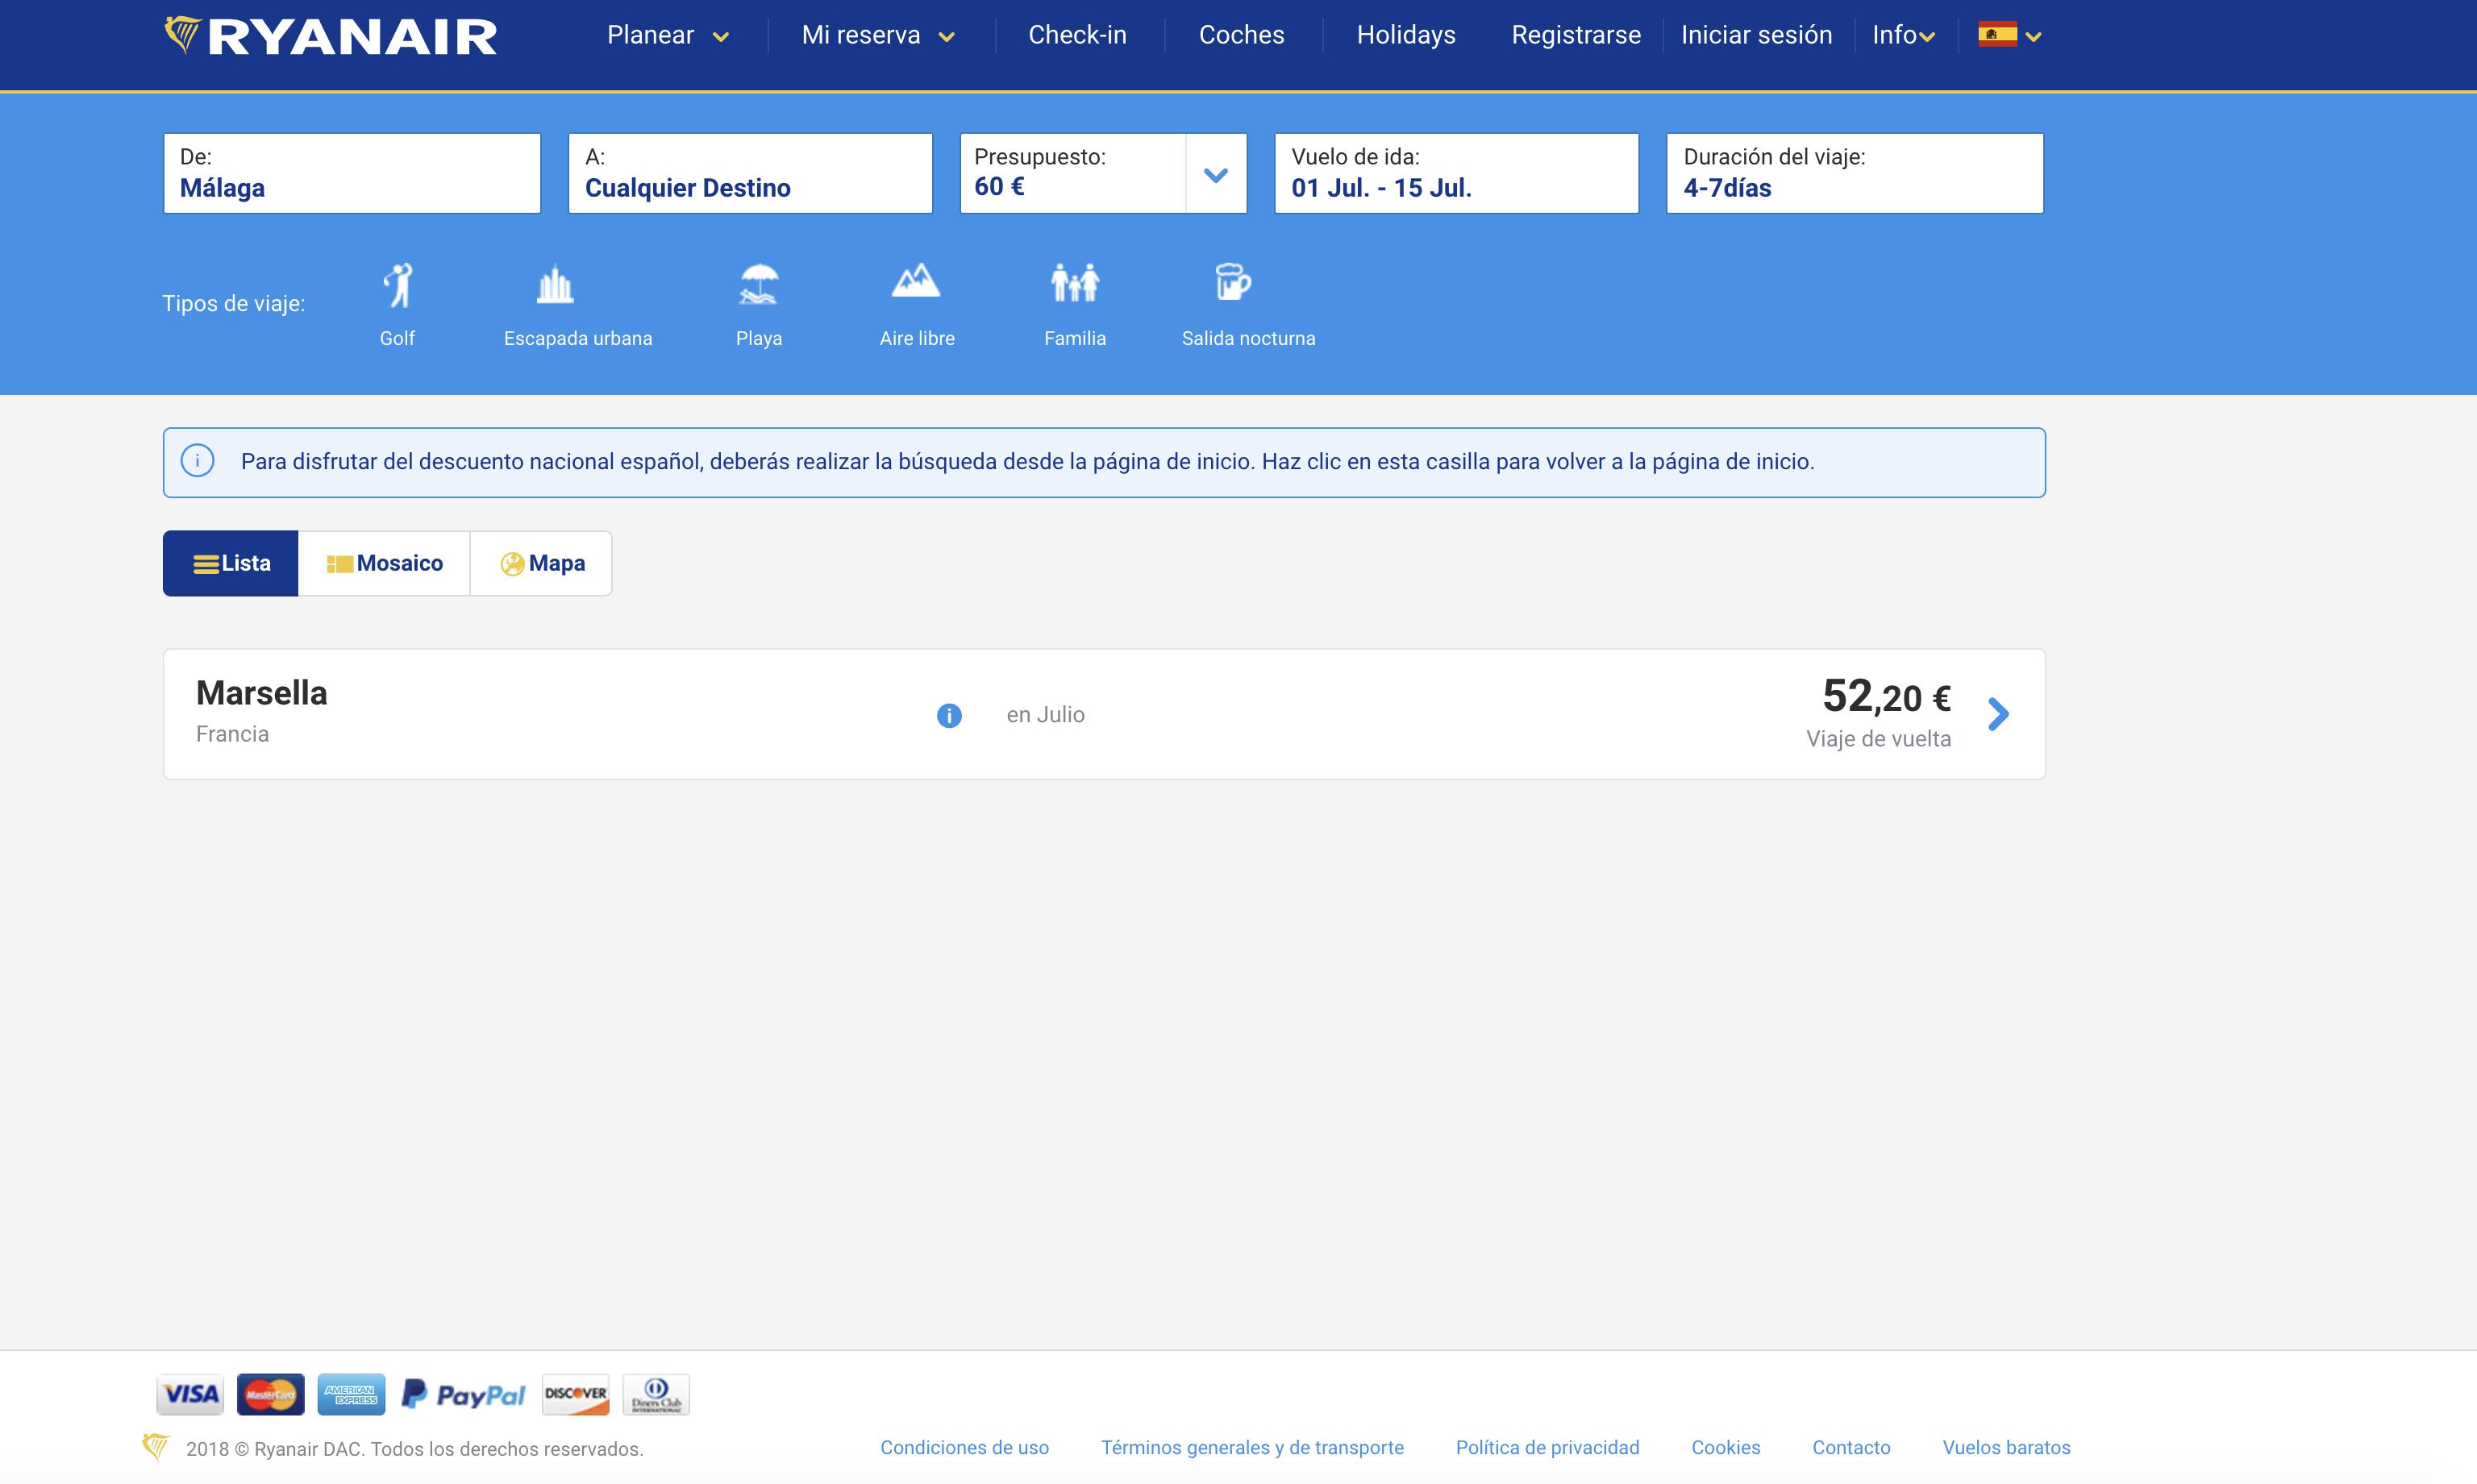 Buscador de vuelos baratos Ryanair